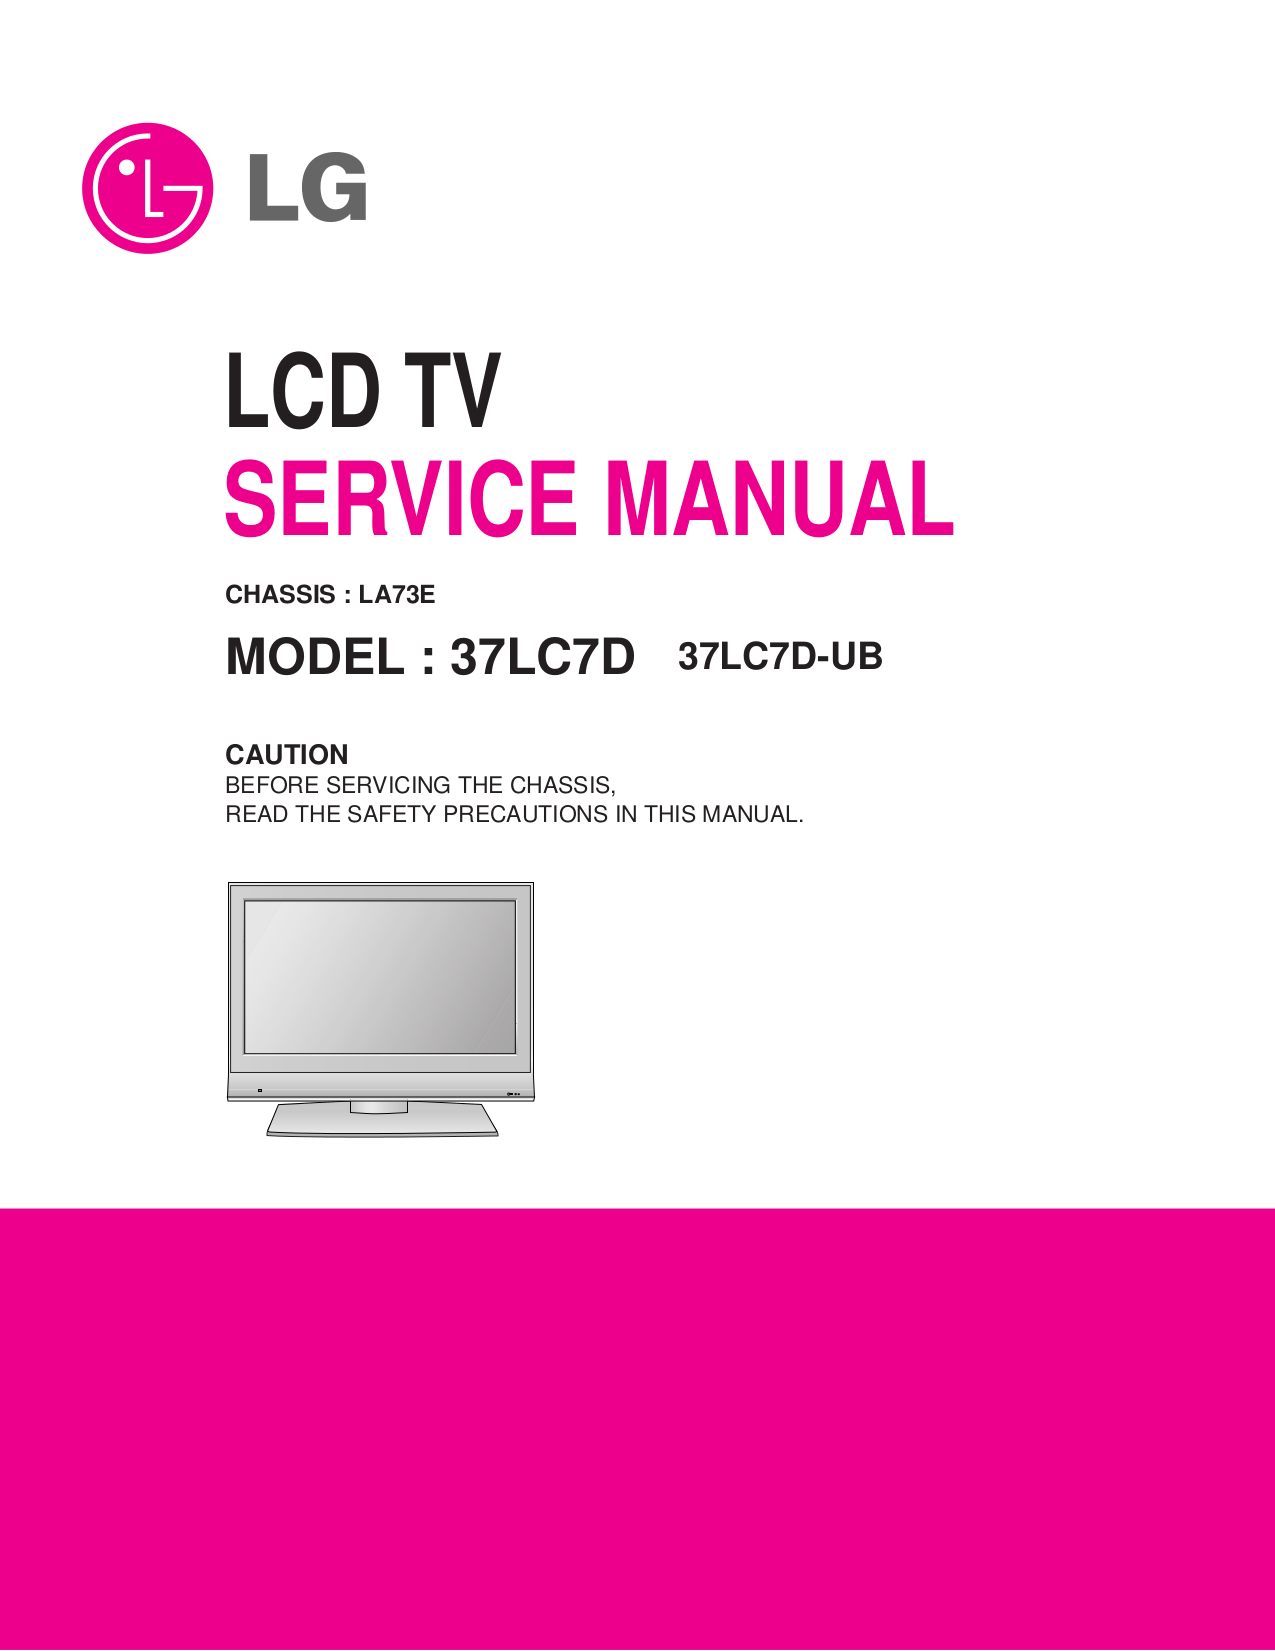 download free pdf for lg 26lc7d tv manual rh umlib com LG Touch Phone Operating Manual LG Manuals PDF